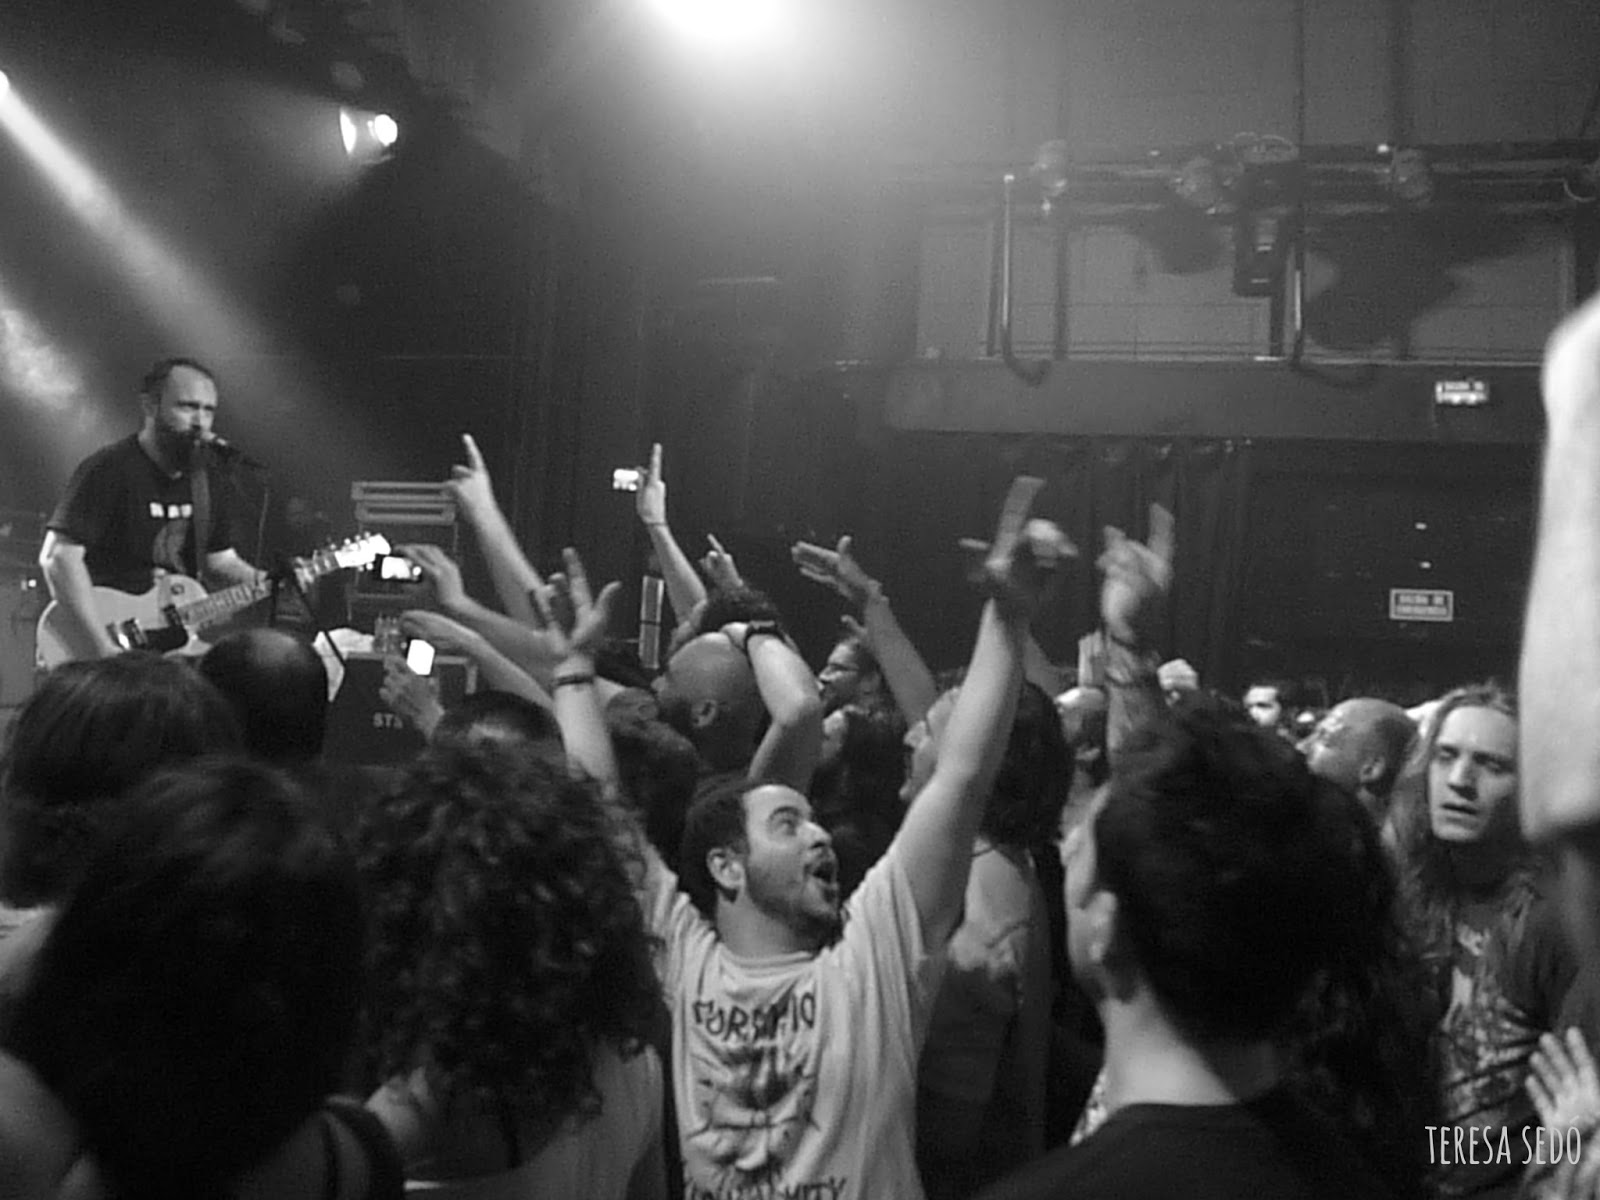 clutch grass music hall barcelona 14 06 2013 On sala imperator barcelona